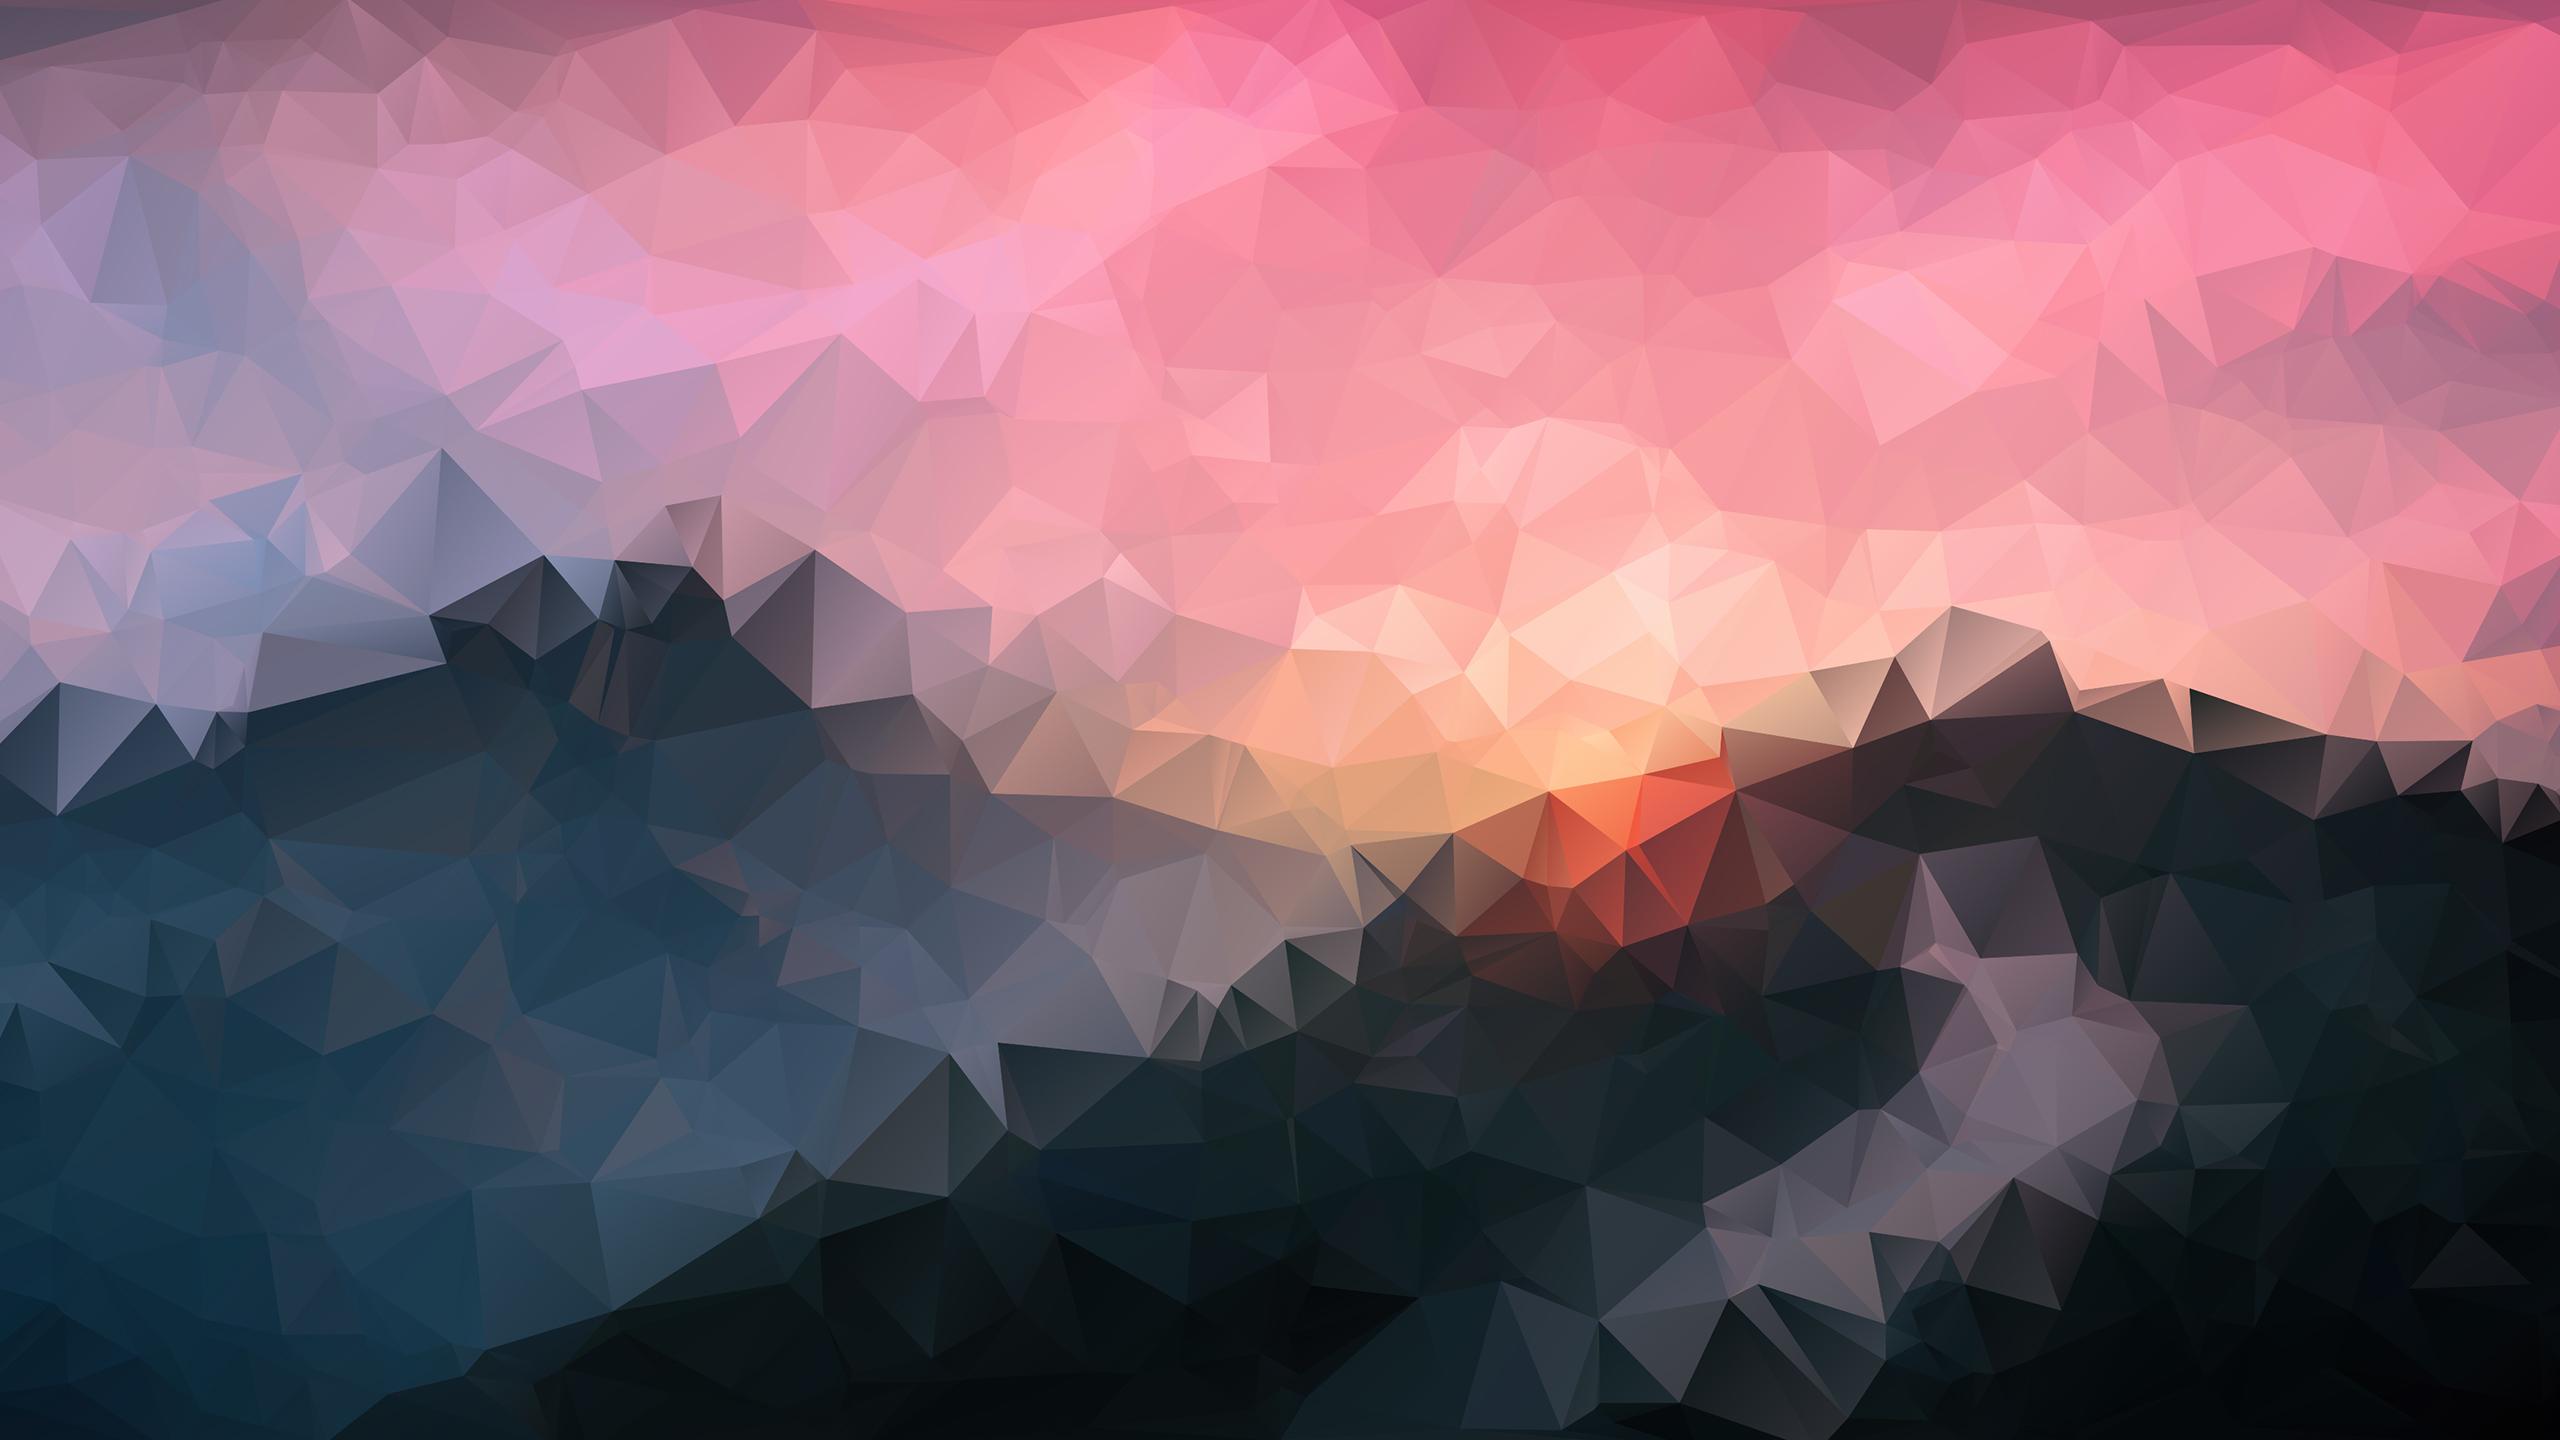 Good Wallpaper Mountain Polygon - polygon-mountains_62088_2560x1440  Picture_42398.jpg